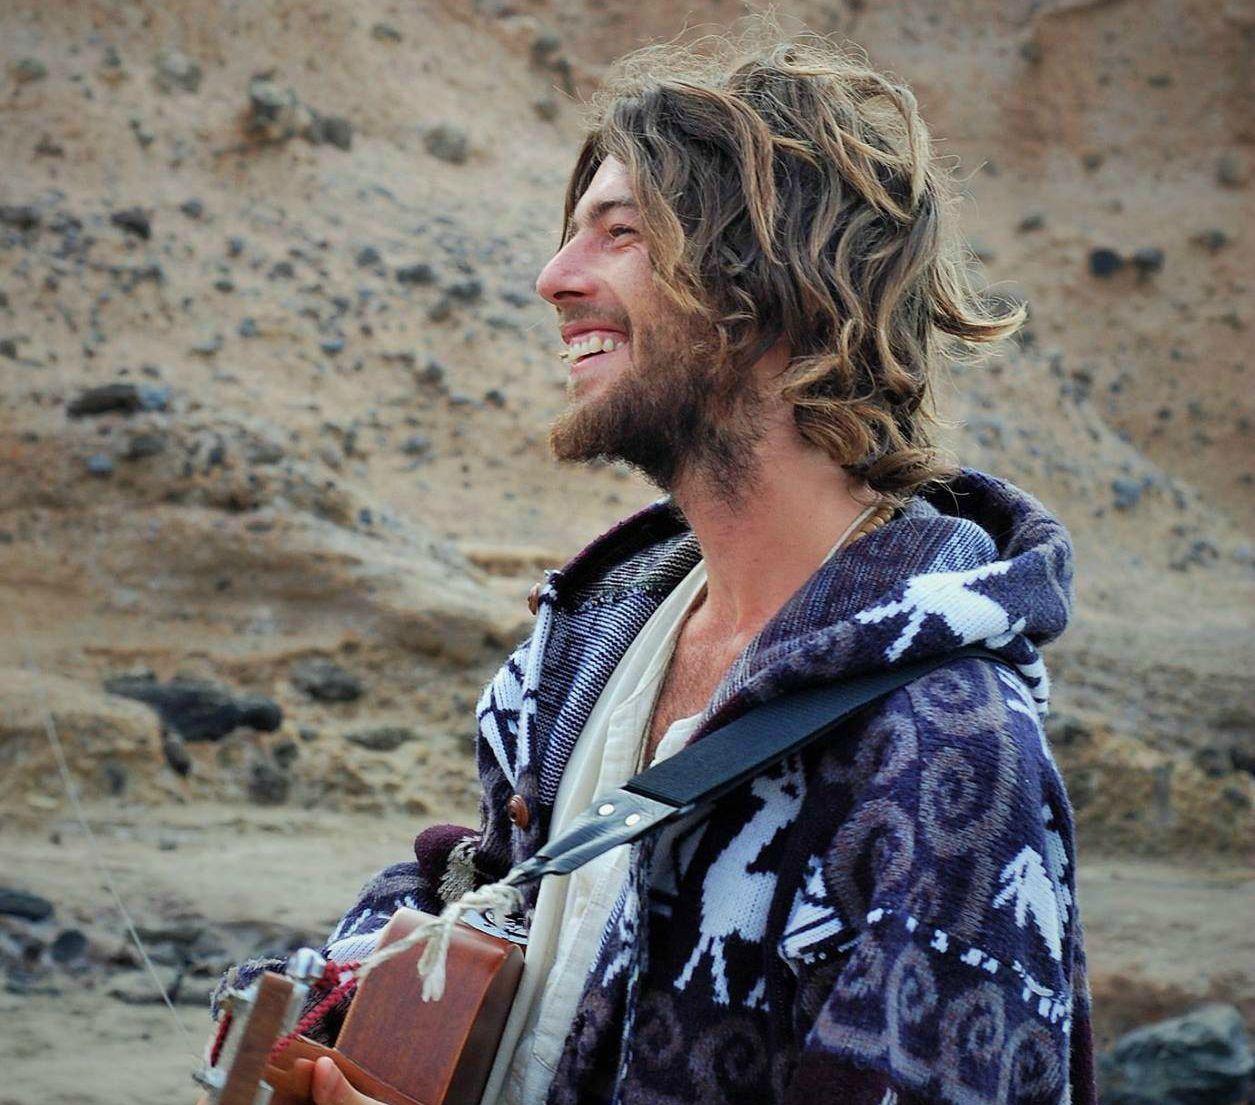 Sam Garrett #Singer #songwriter #interview at 99 Percent Lifestyle